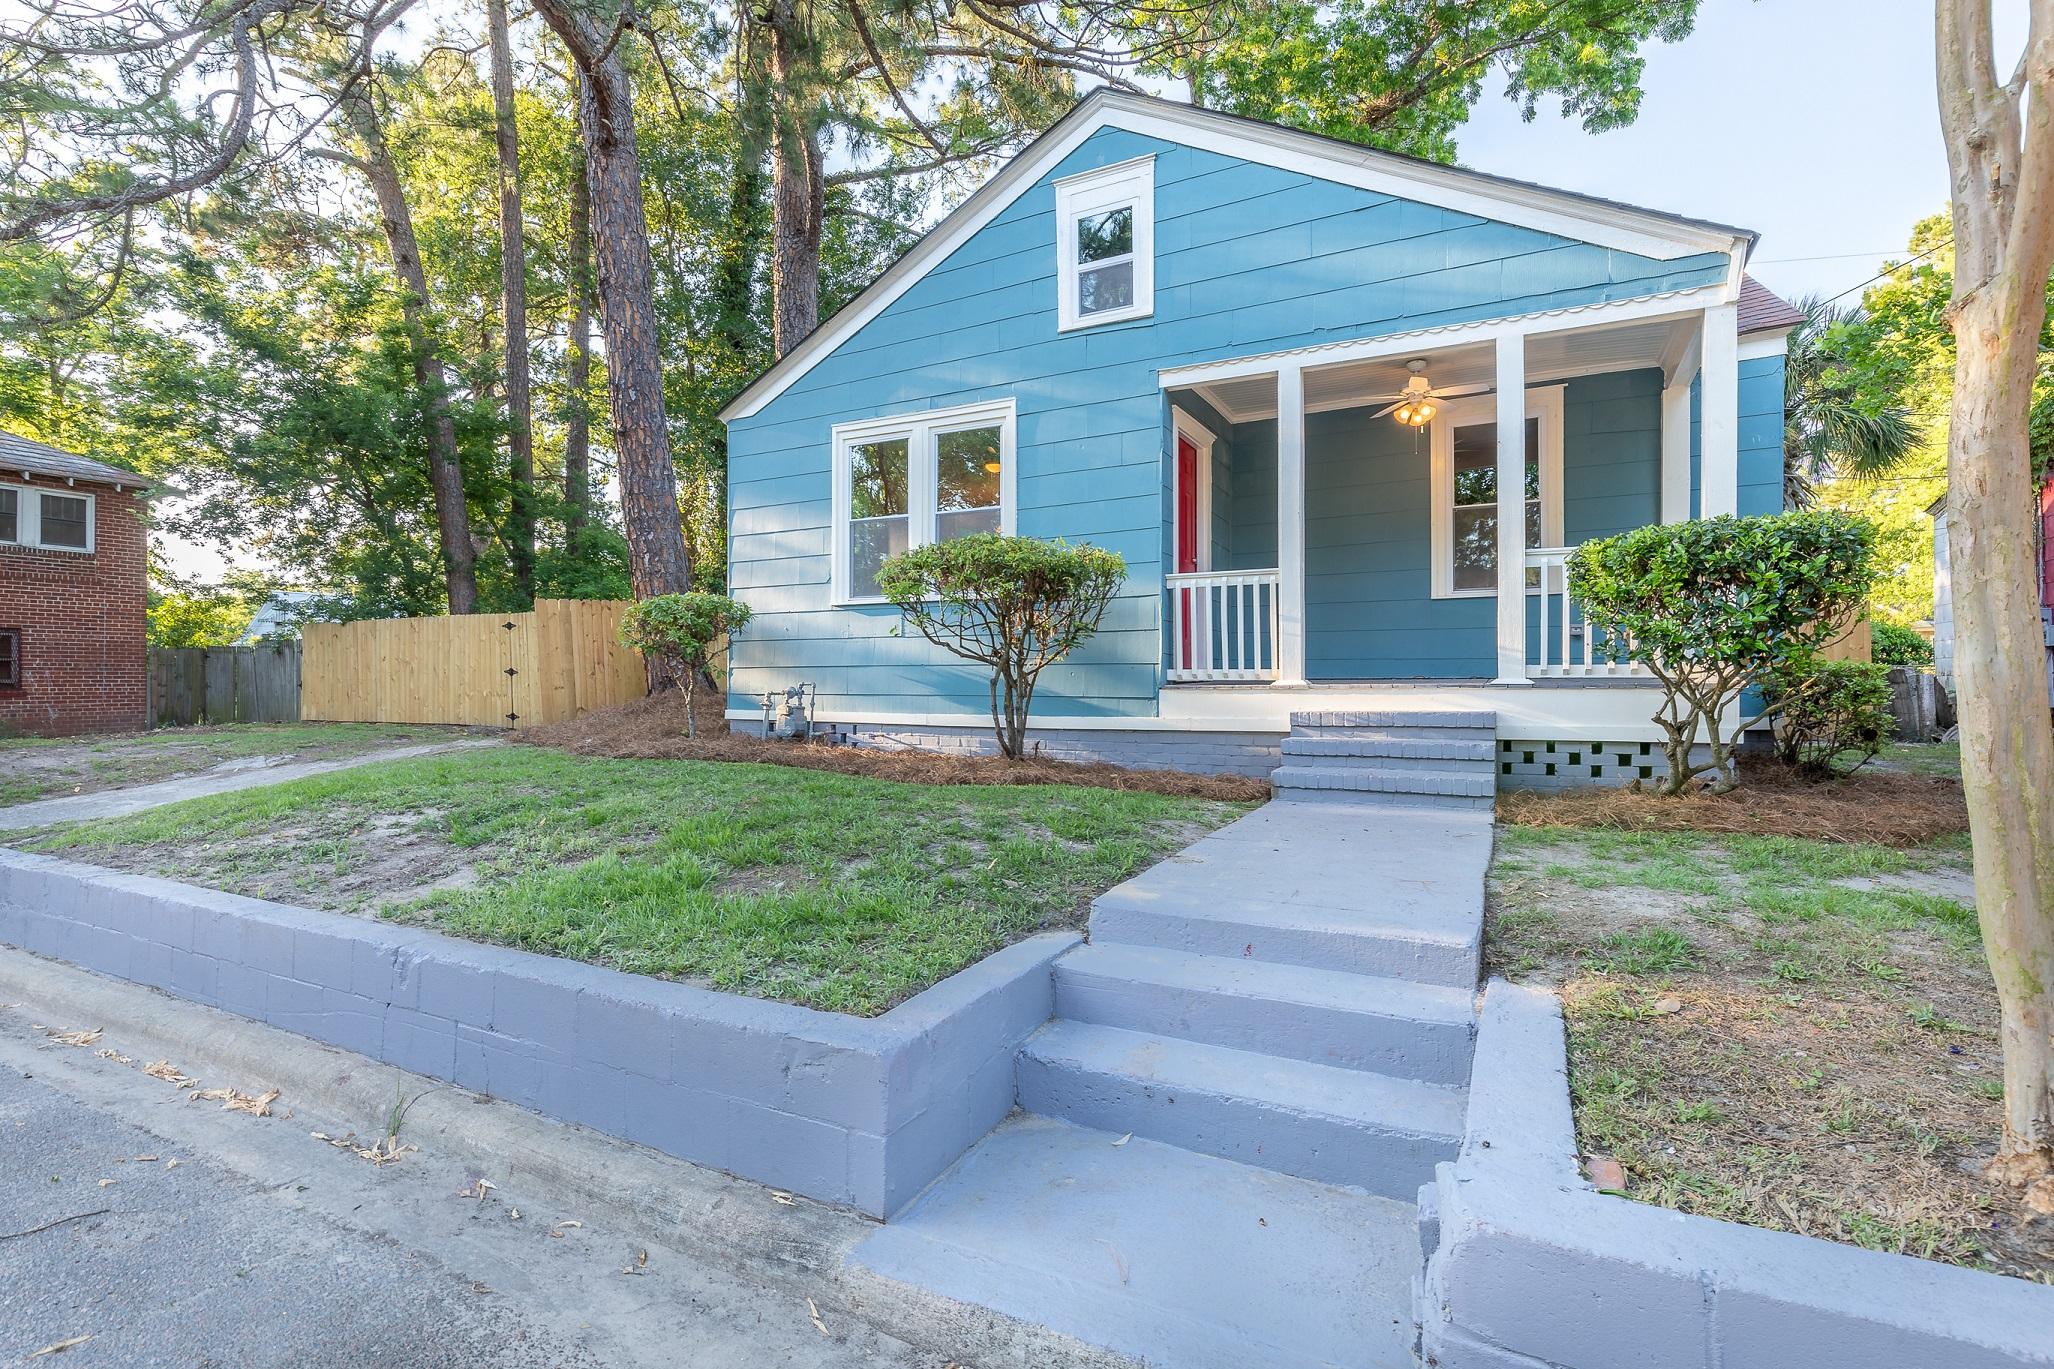 828 Hamilton Court, Savannah, Georgia 31401